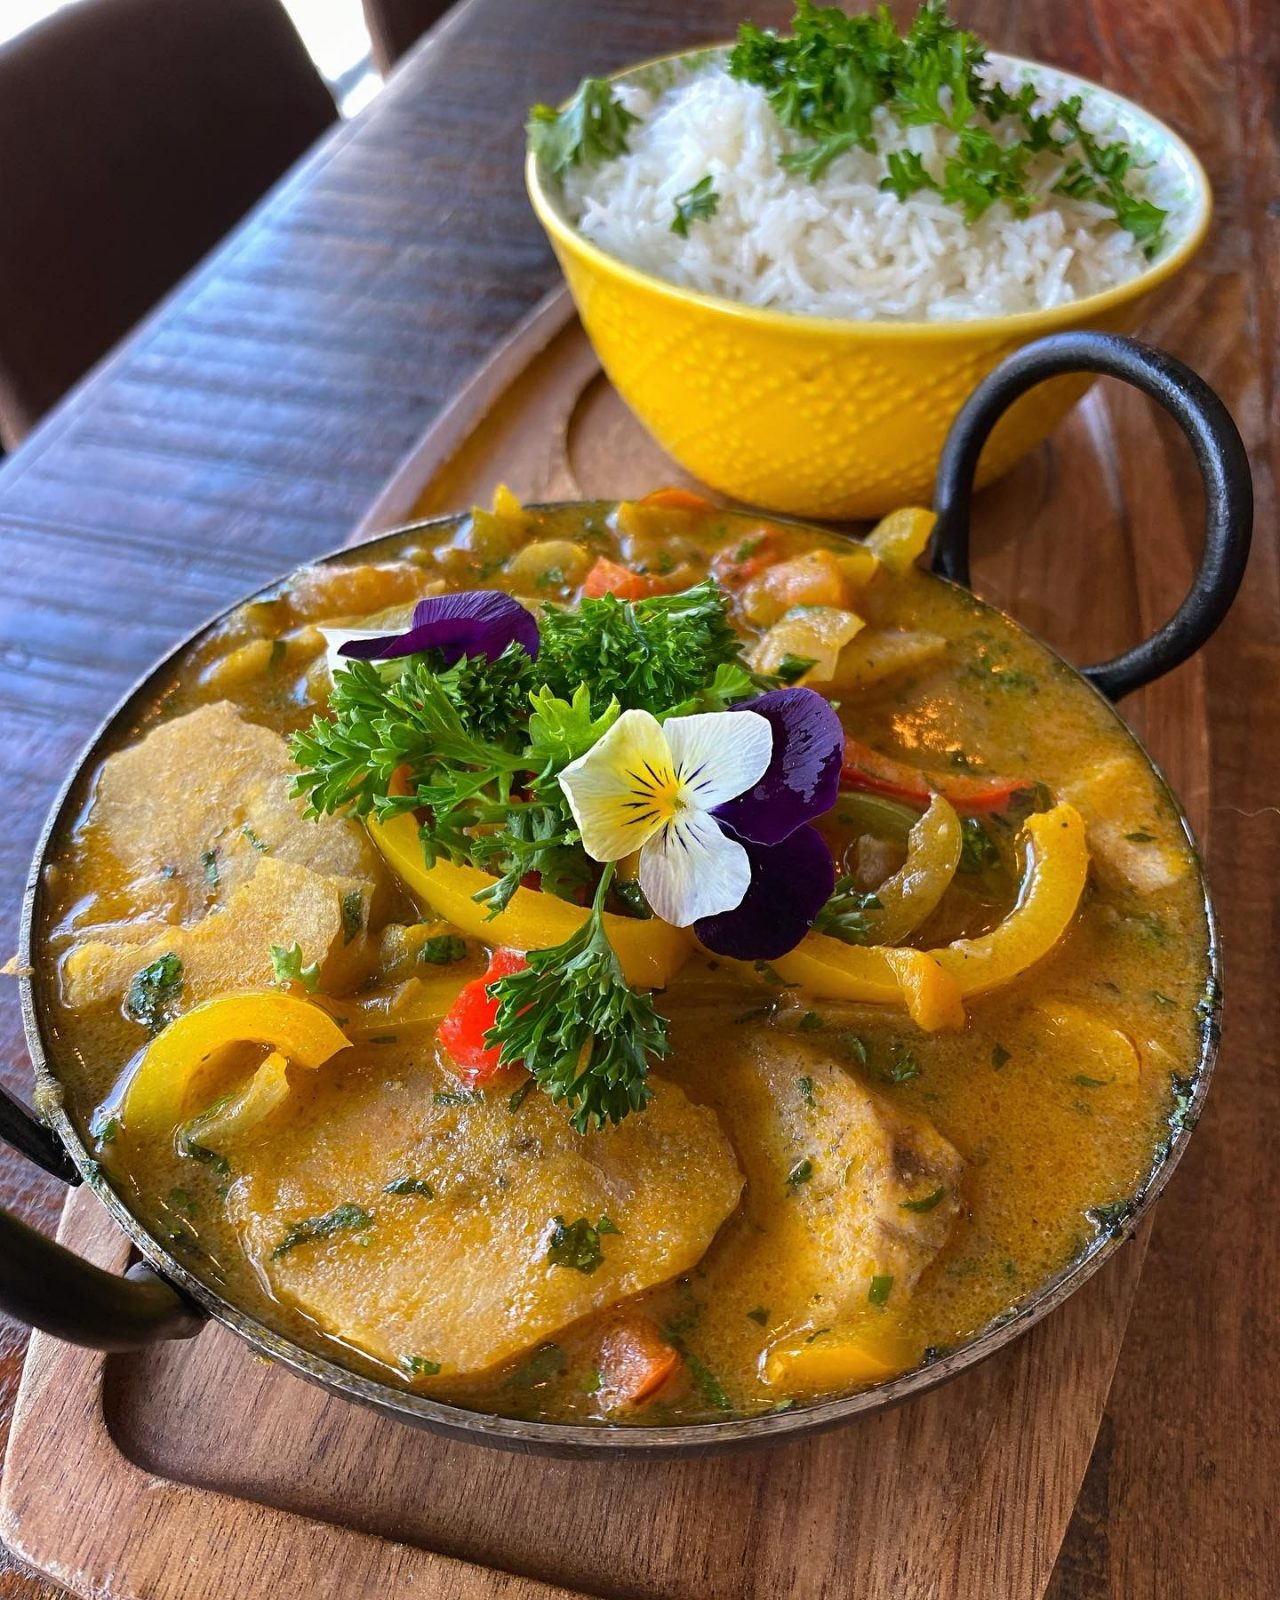 Gorge: The new restaurant bringing a true taste of Latin America to Prestwich, The Manc